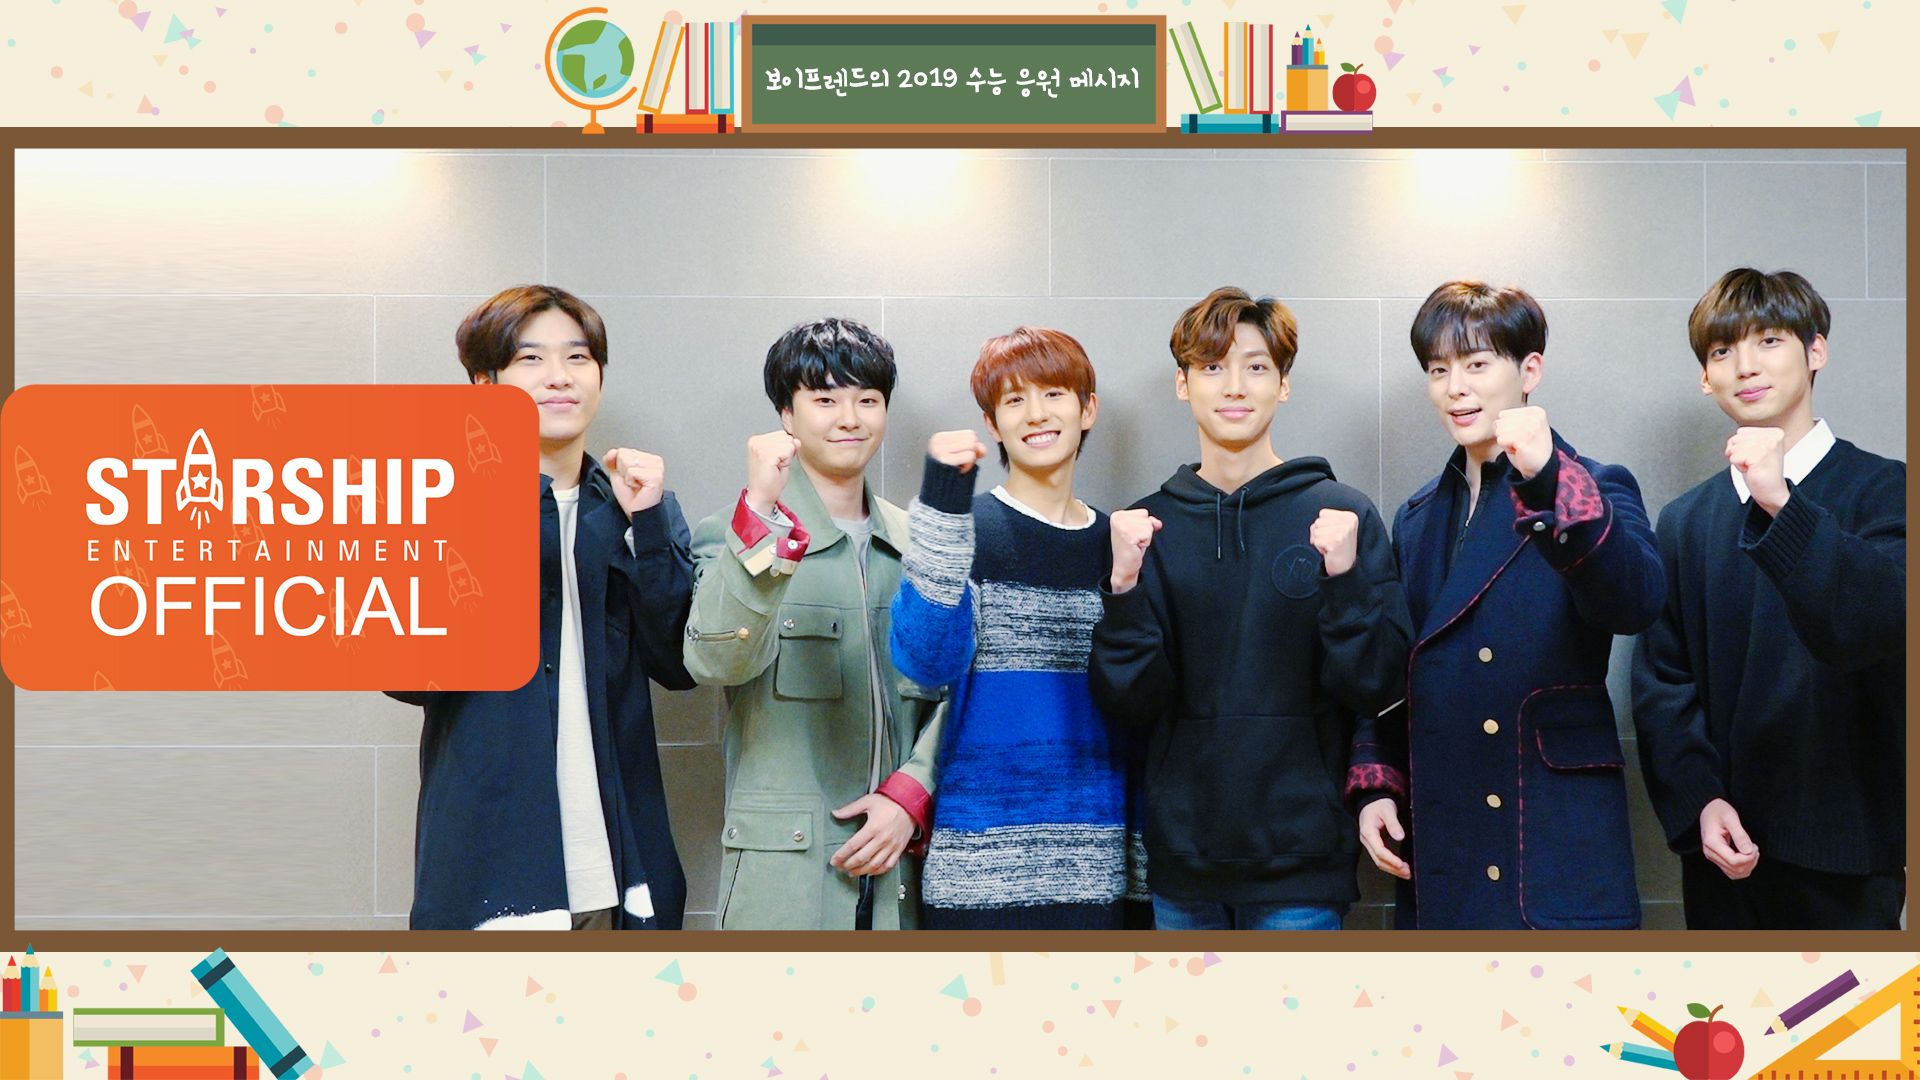 [Special Clip] 보이프렌드(BOYFRIEND) - 2019 수능 응원영상